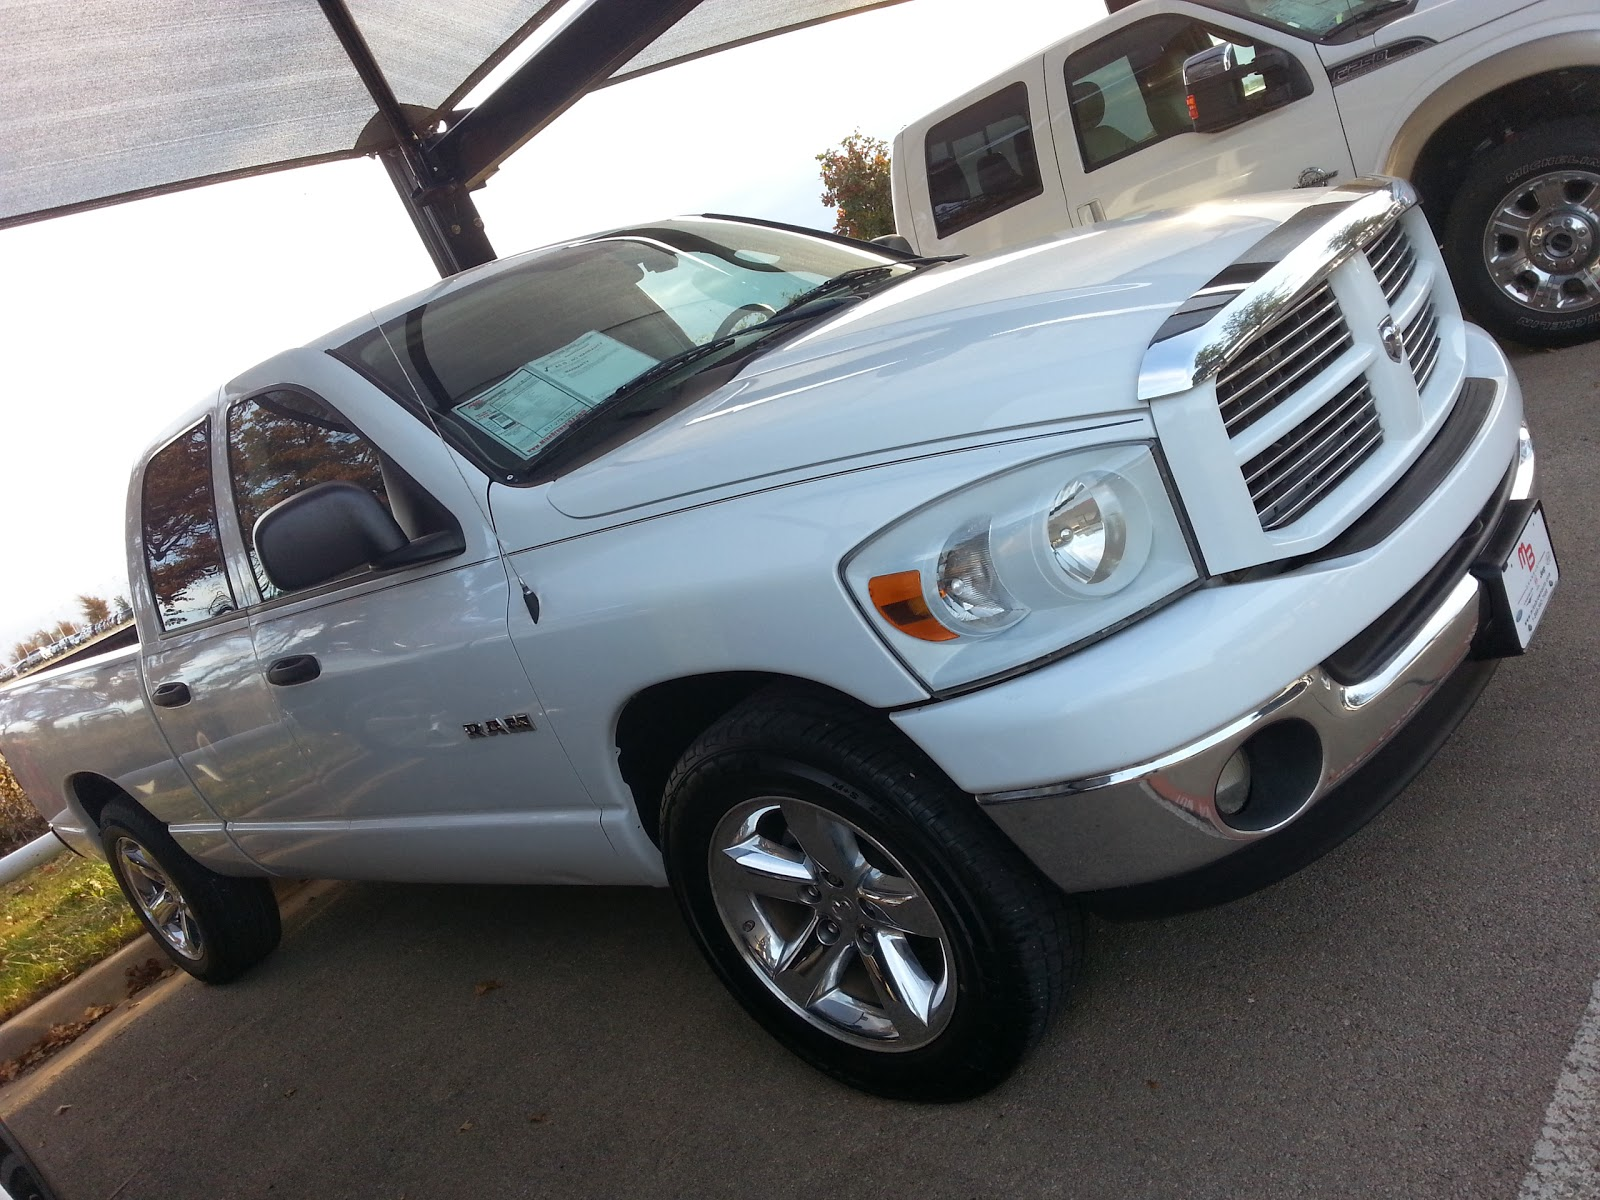 15 990 For Sale 2008 Dodge Ram 1500 Truck 74k Miles V8